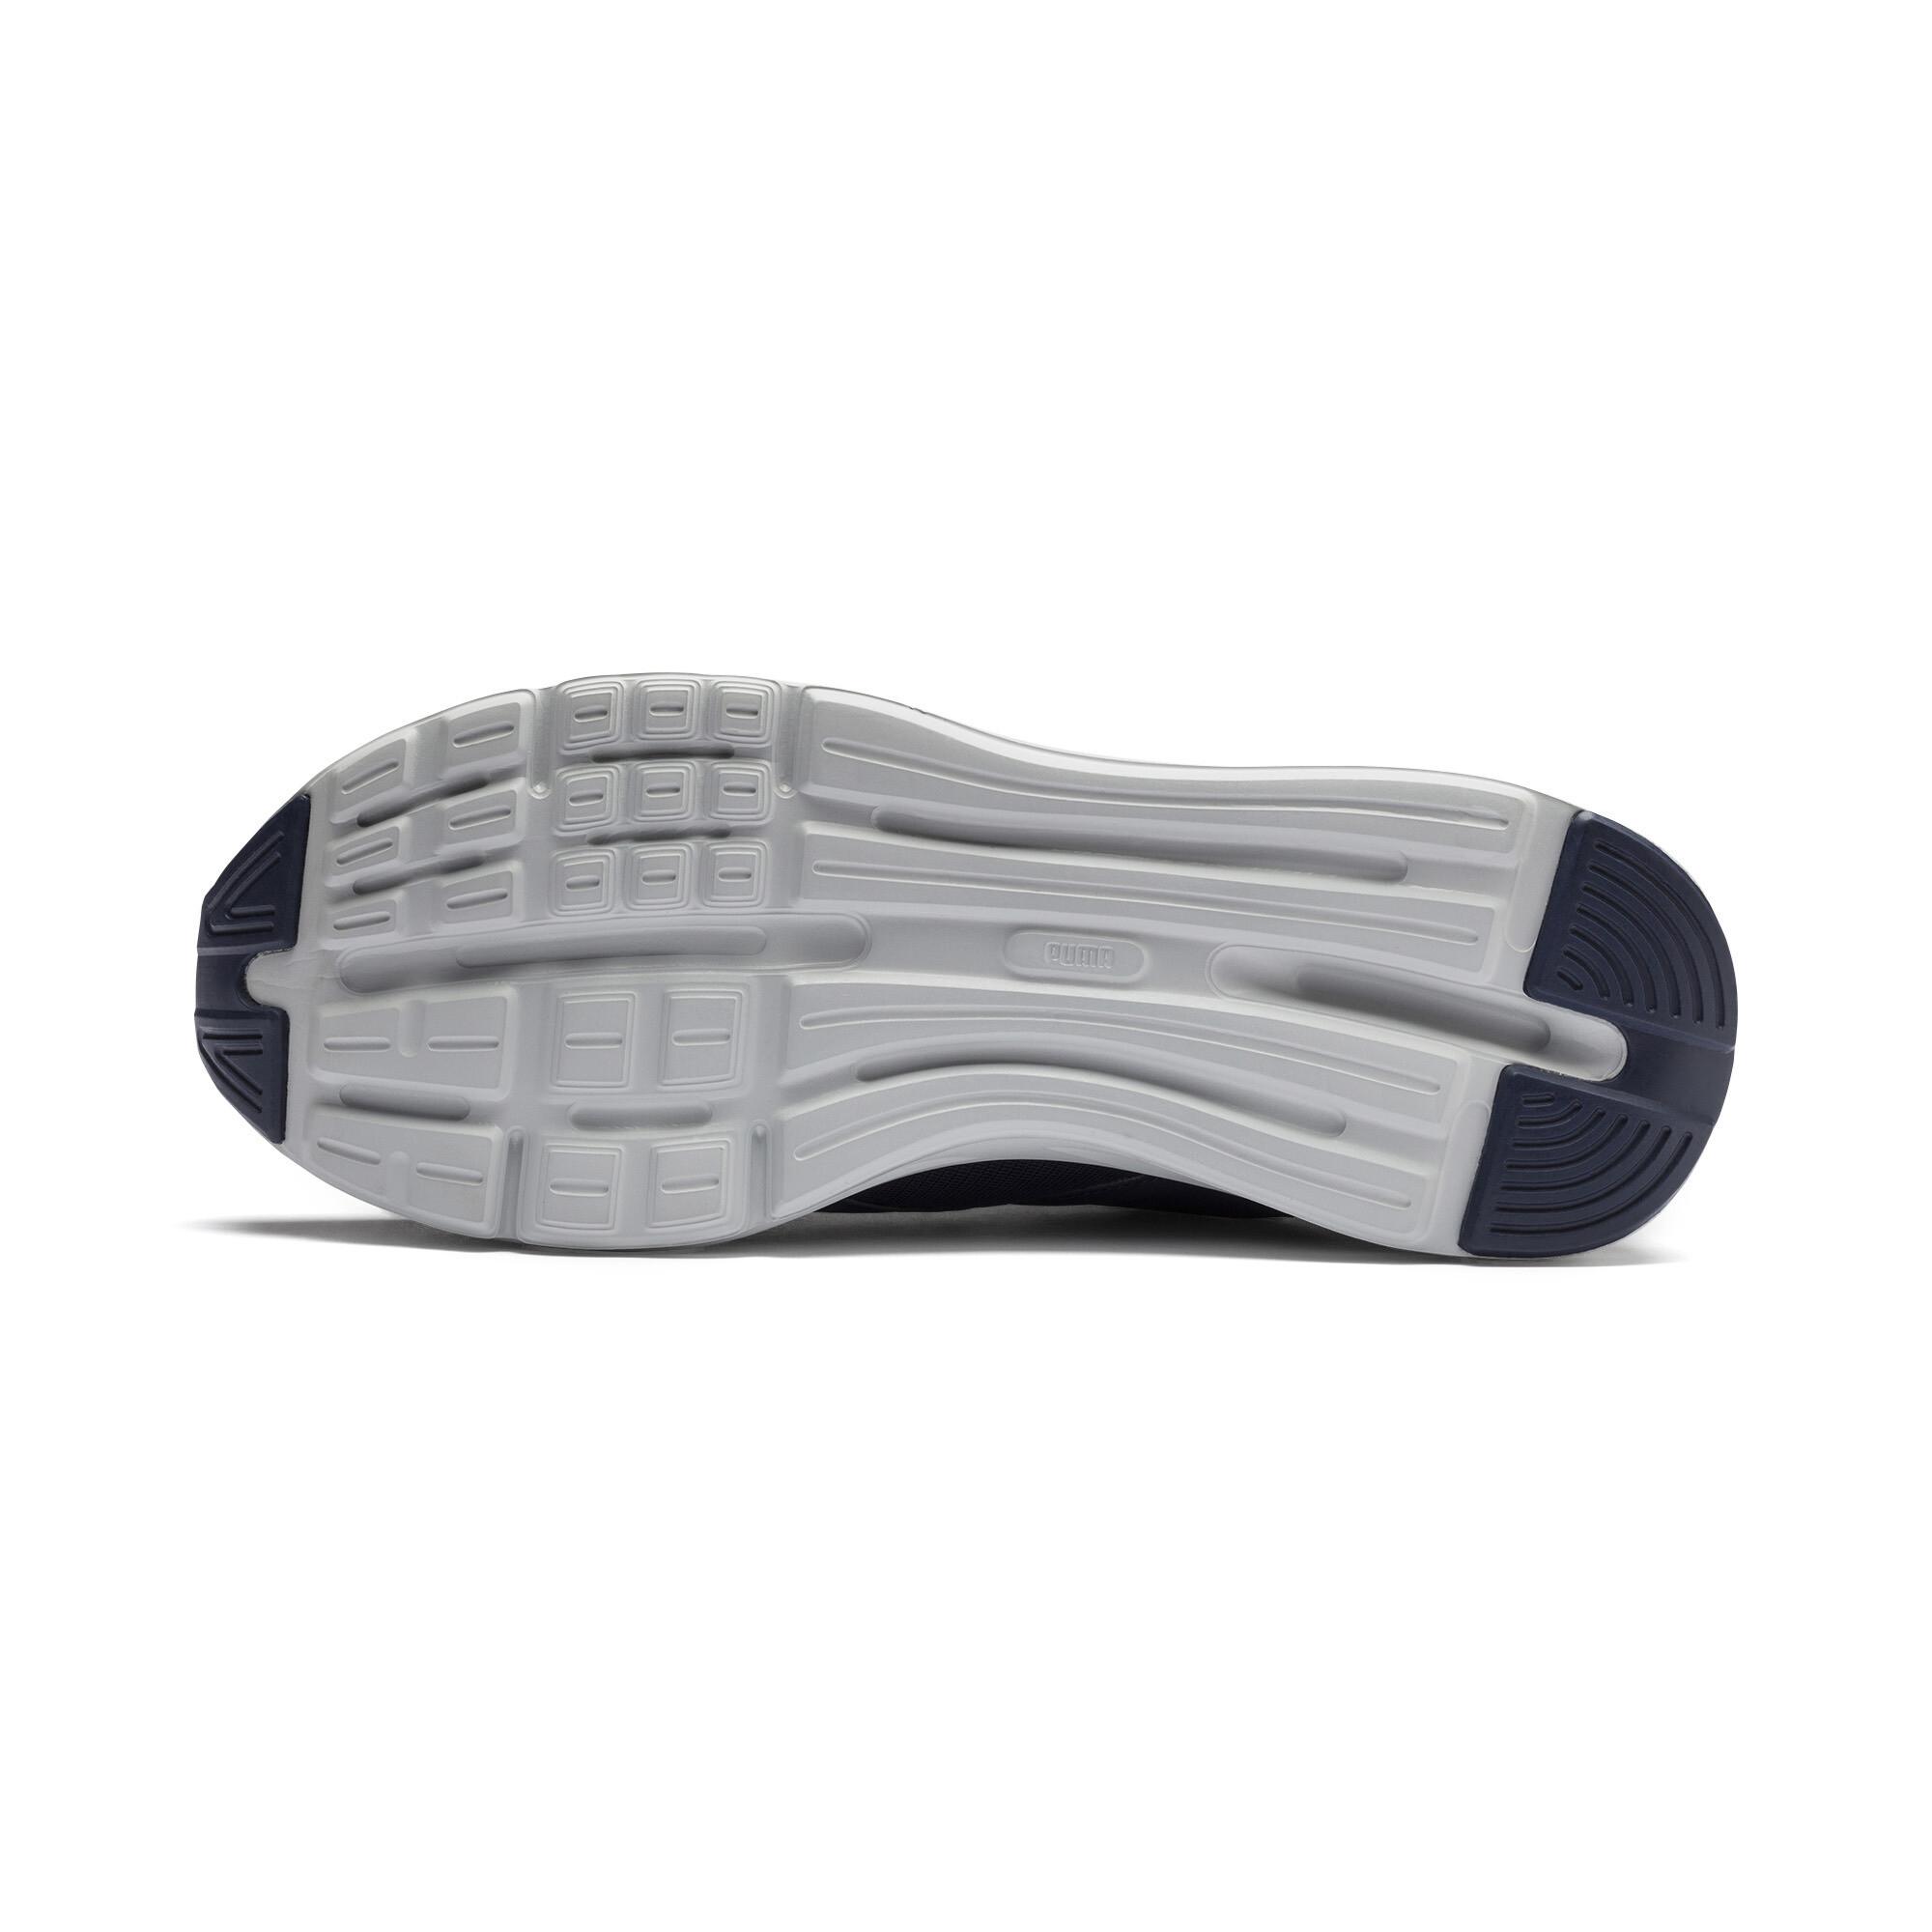 PUMA-Enzo-Geo-Men-s-Sneakers-Men-Shoe-Running thumbnail 5